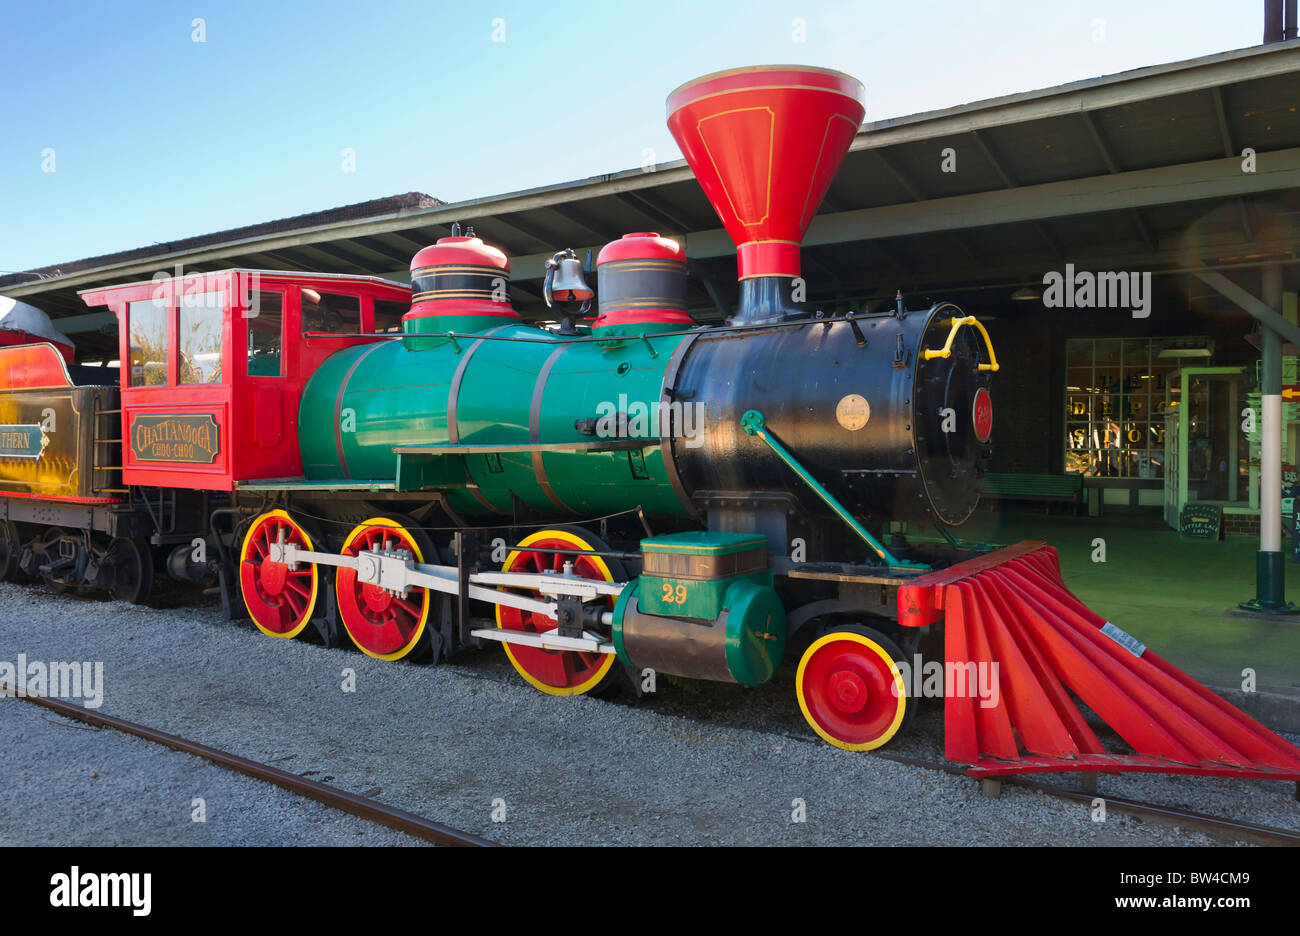 The Chattanooga Choo Choo Train Inside The Chattanooga